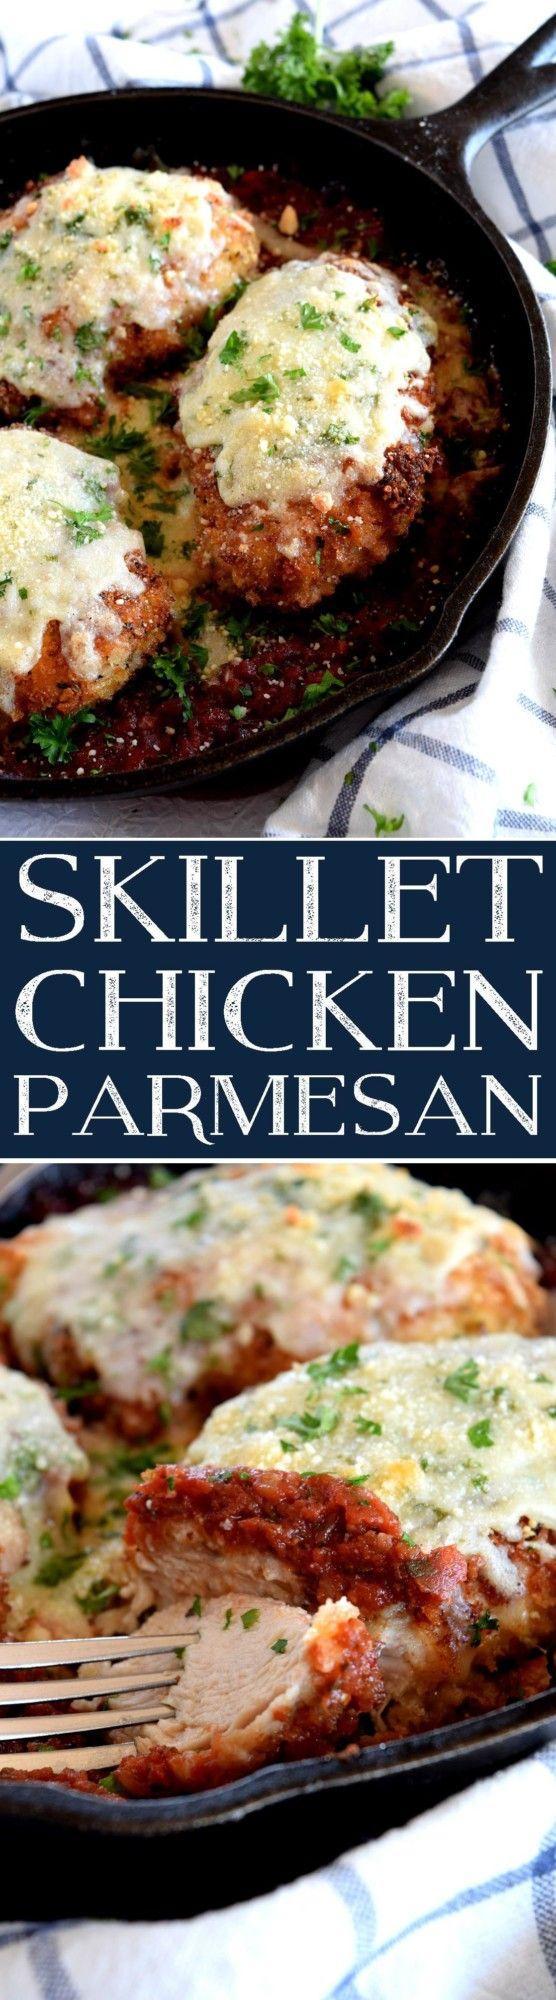 Skillet Chicken Parmesan - Lord Byron's Kitchen